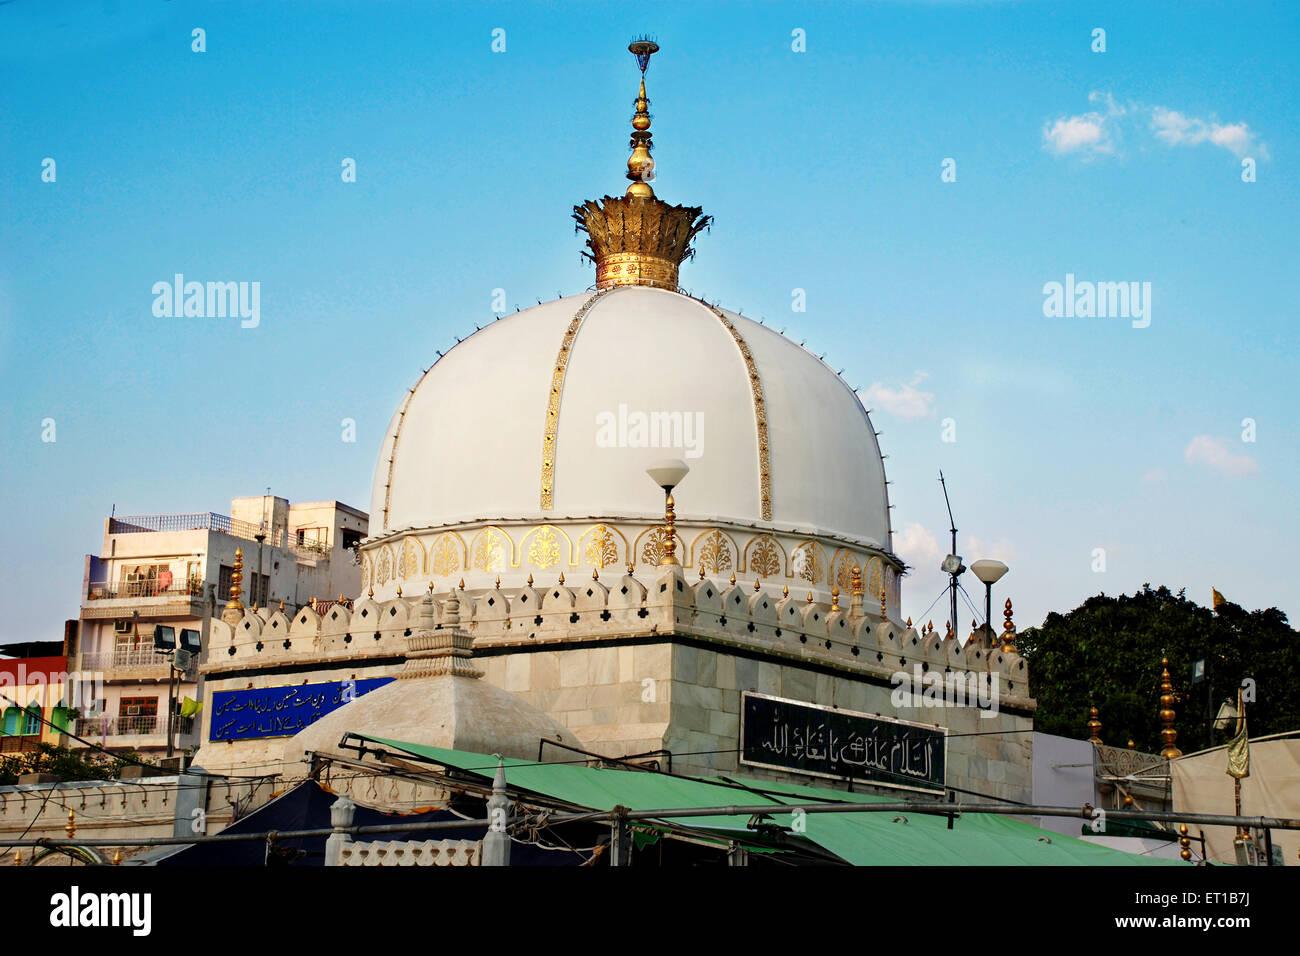 Wallpaper of khwaja gharib nawaz wallpaper.